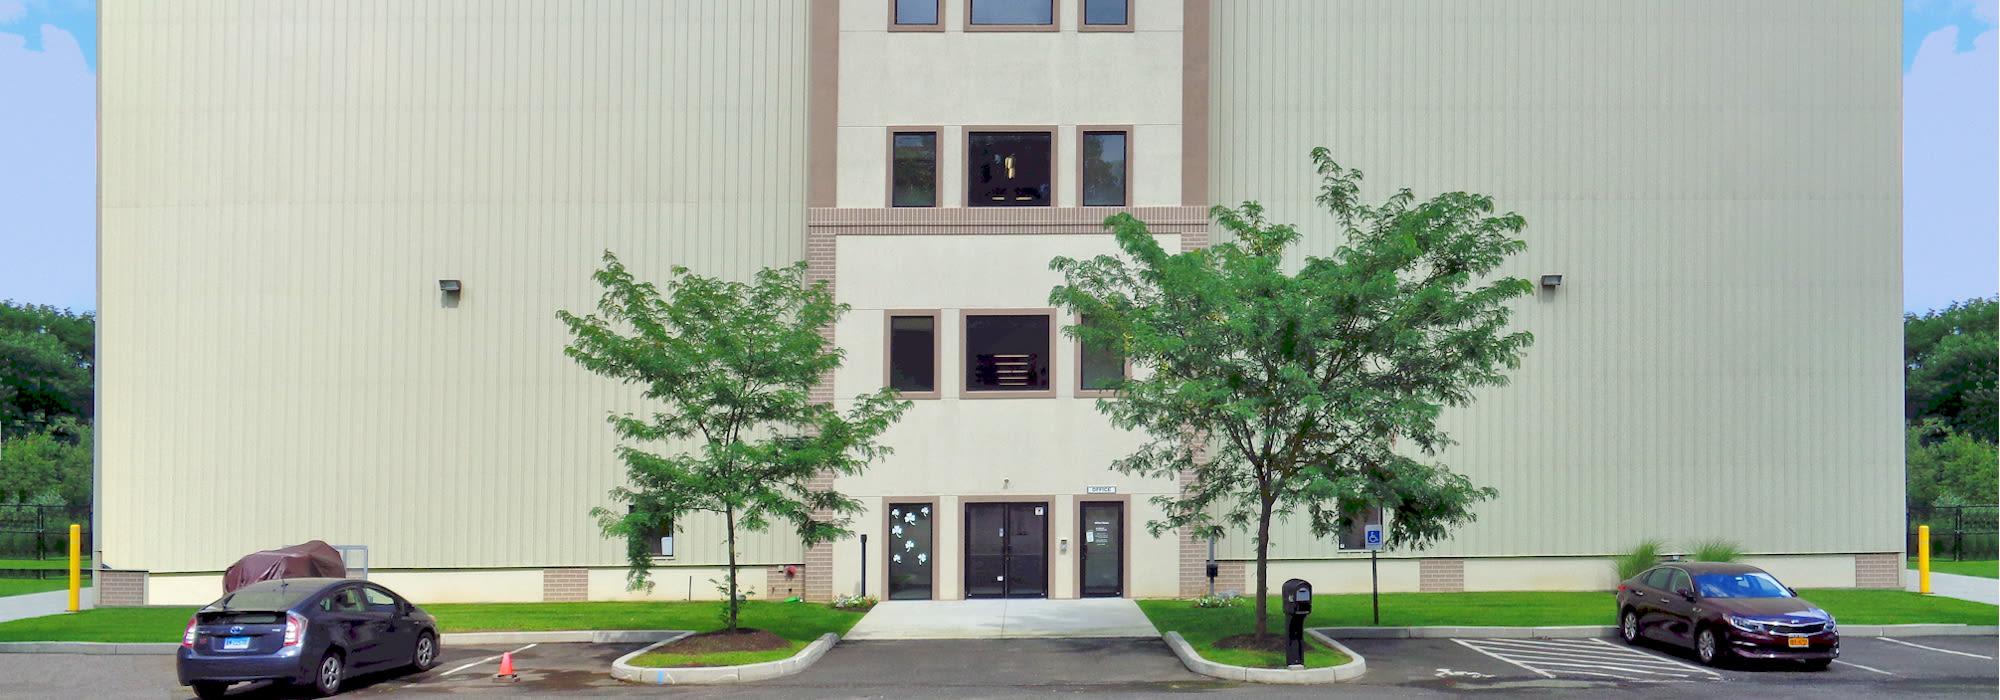 Prime Storage in Danbury, CT